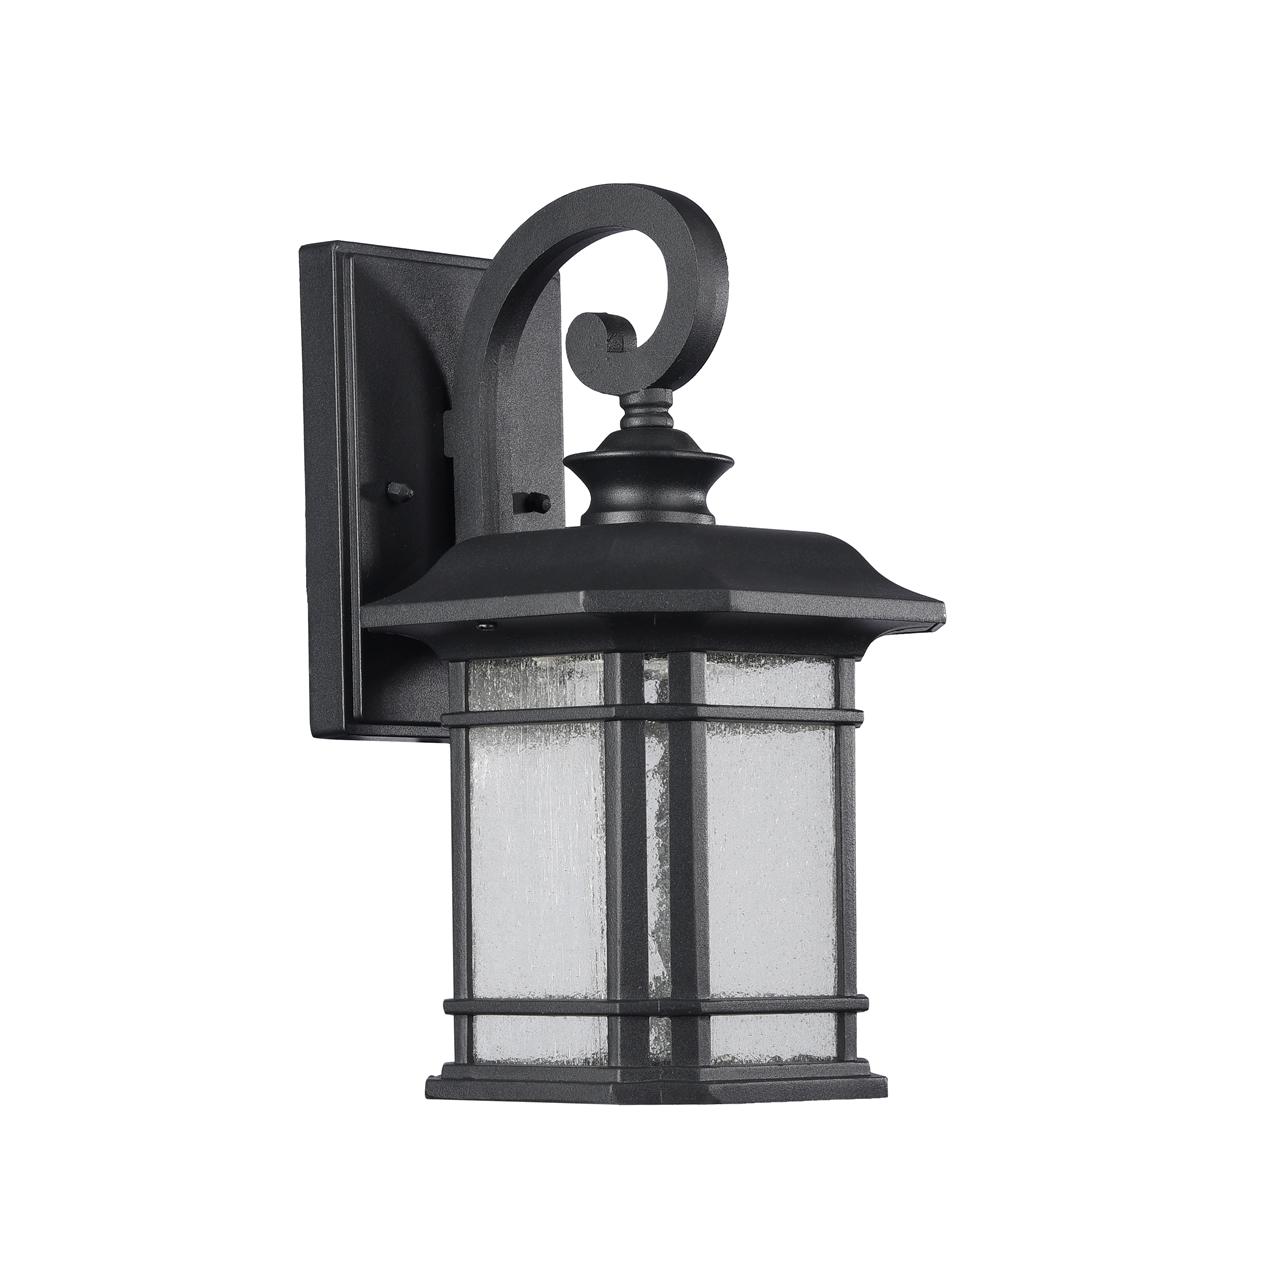 CHLOE Lighting, Inc Lighting wholesale, Lighting ... on Sconce Outdoor Lighting id=86800